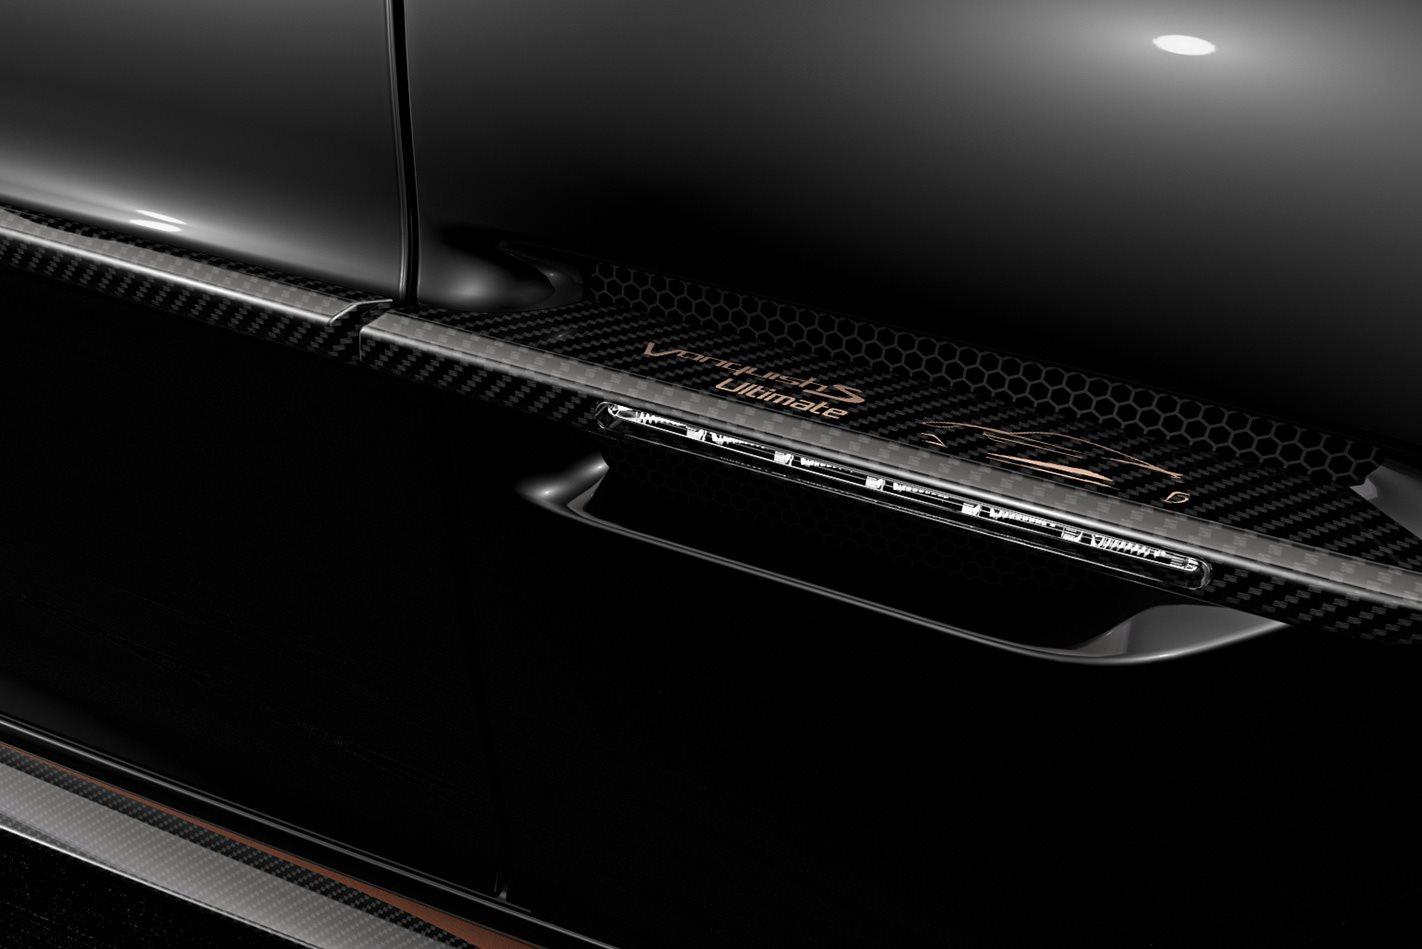 Aston-Martin-Vanquish-Ultimate-side.jpg